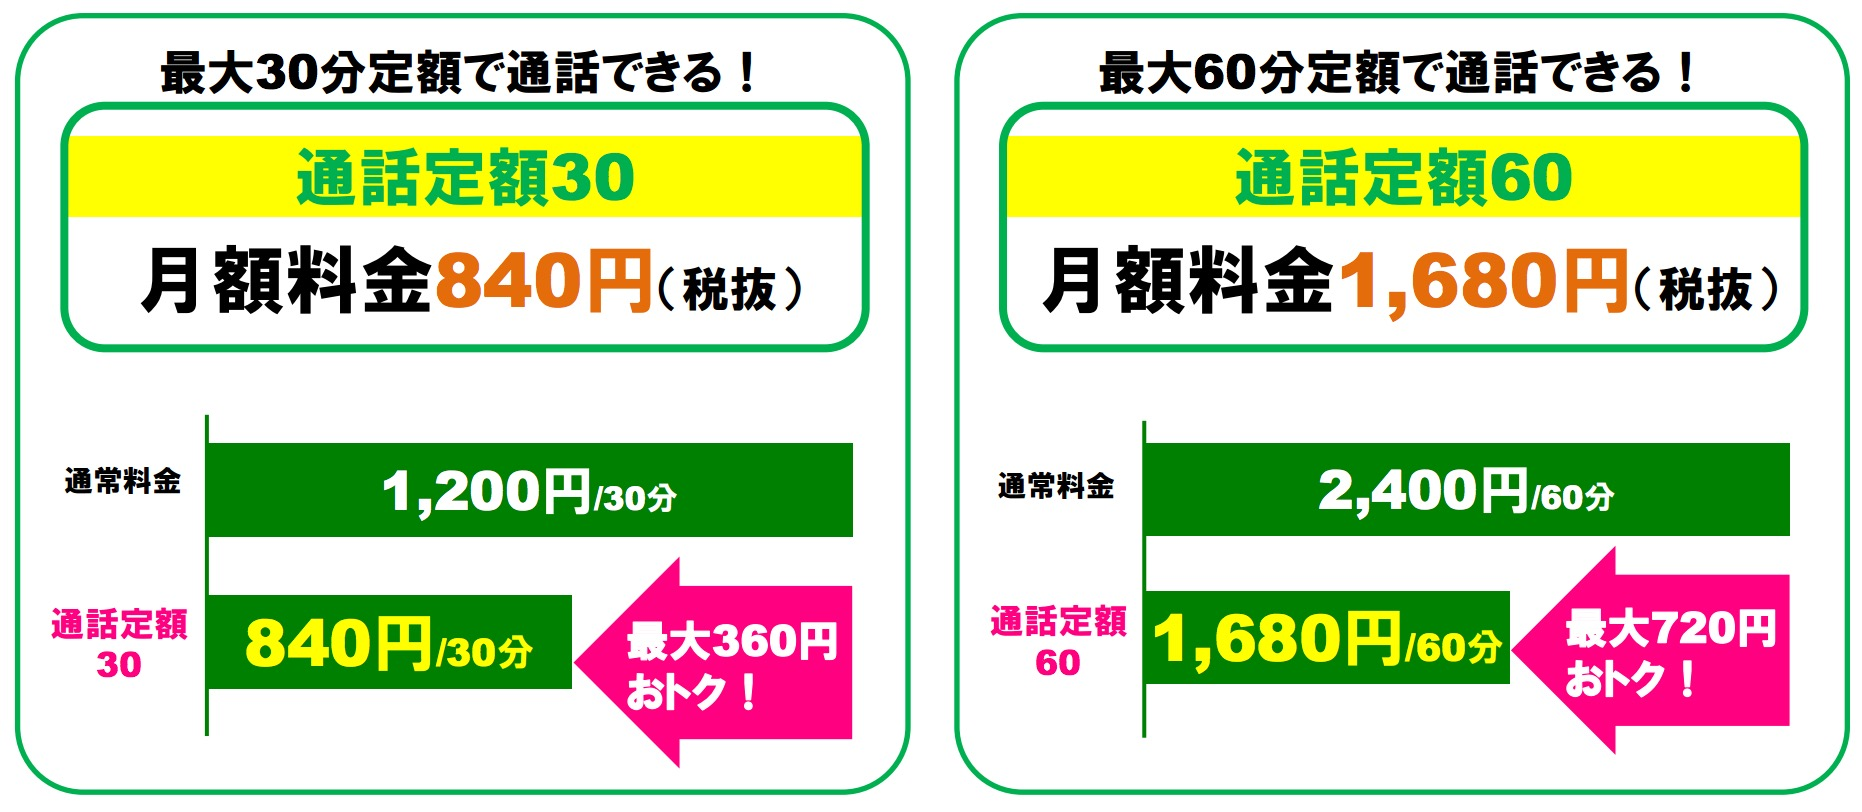 ss 2016-05-31 16.51.55